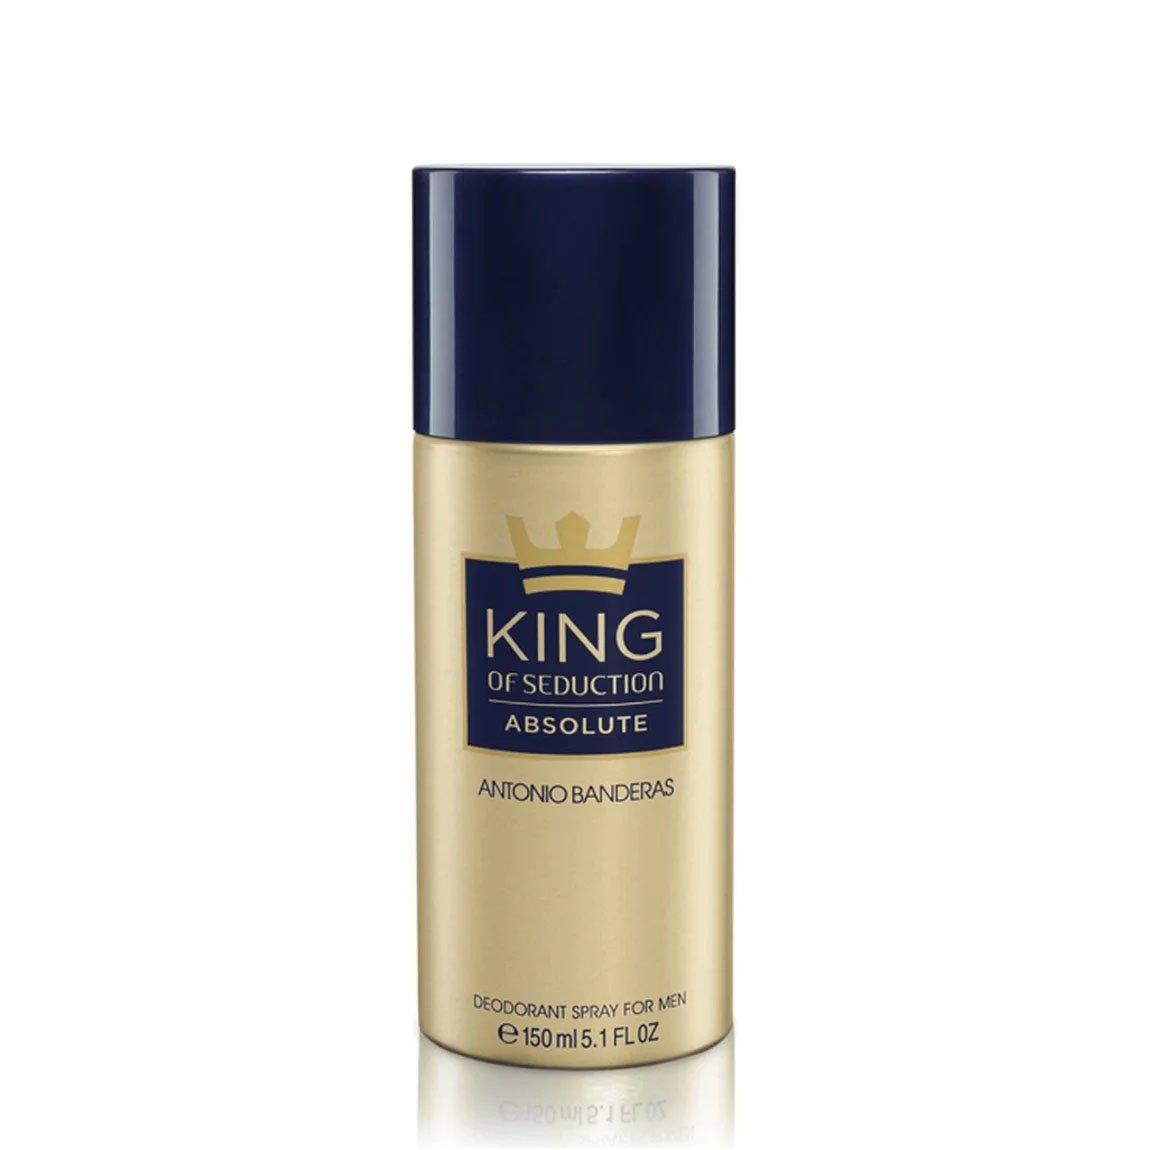 perfume desodorante antonio banderas king of seduction absolute 150 ml 50751 2000 202379 1